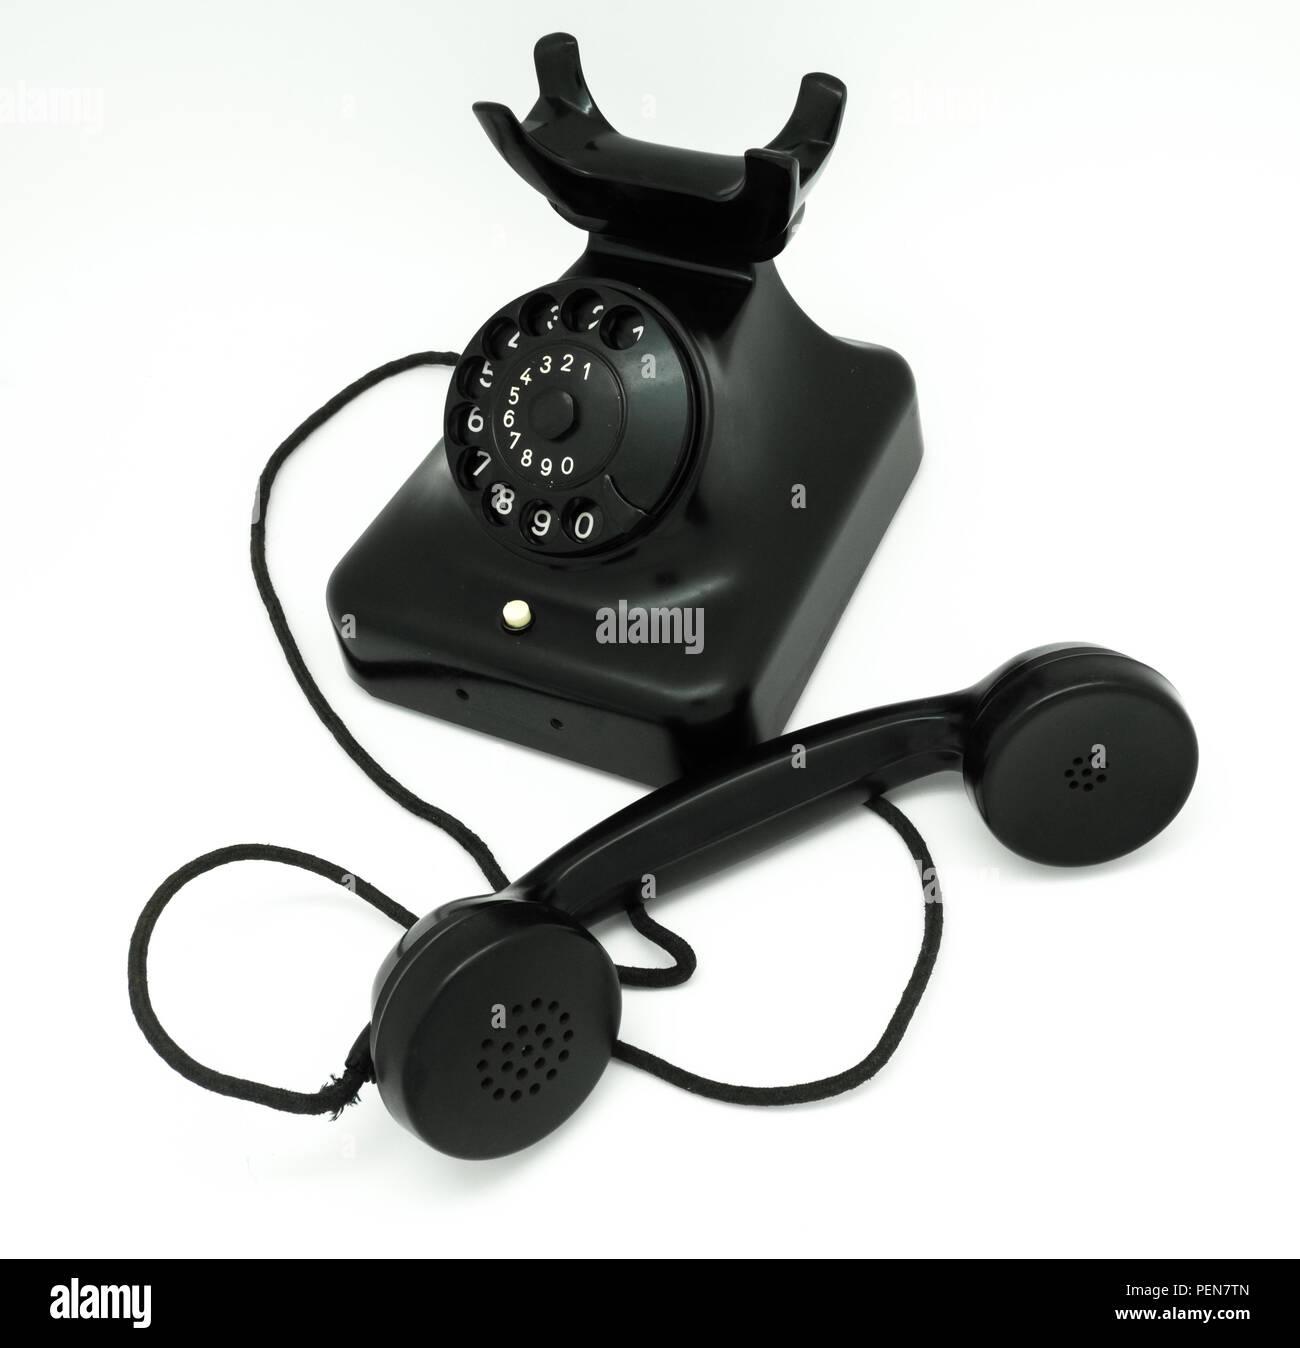 Antikes schwarzes Telefon W48 aus Backelit 50er Jahre - Stock Image